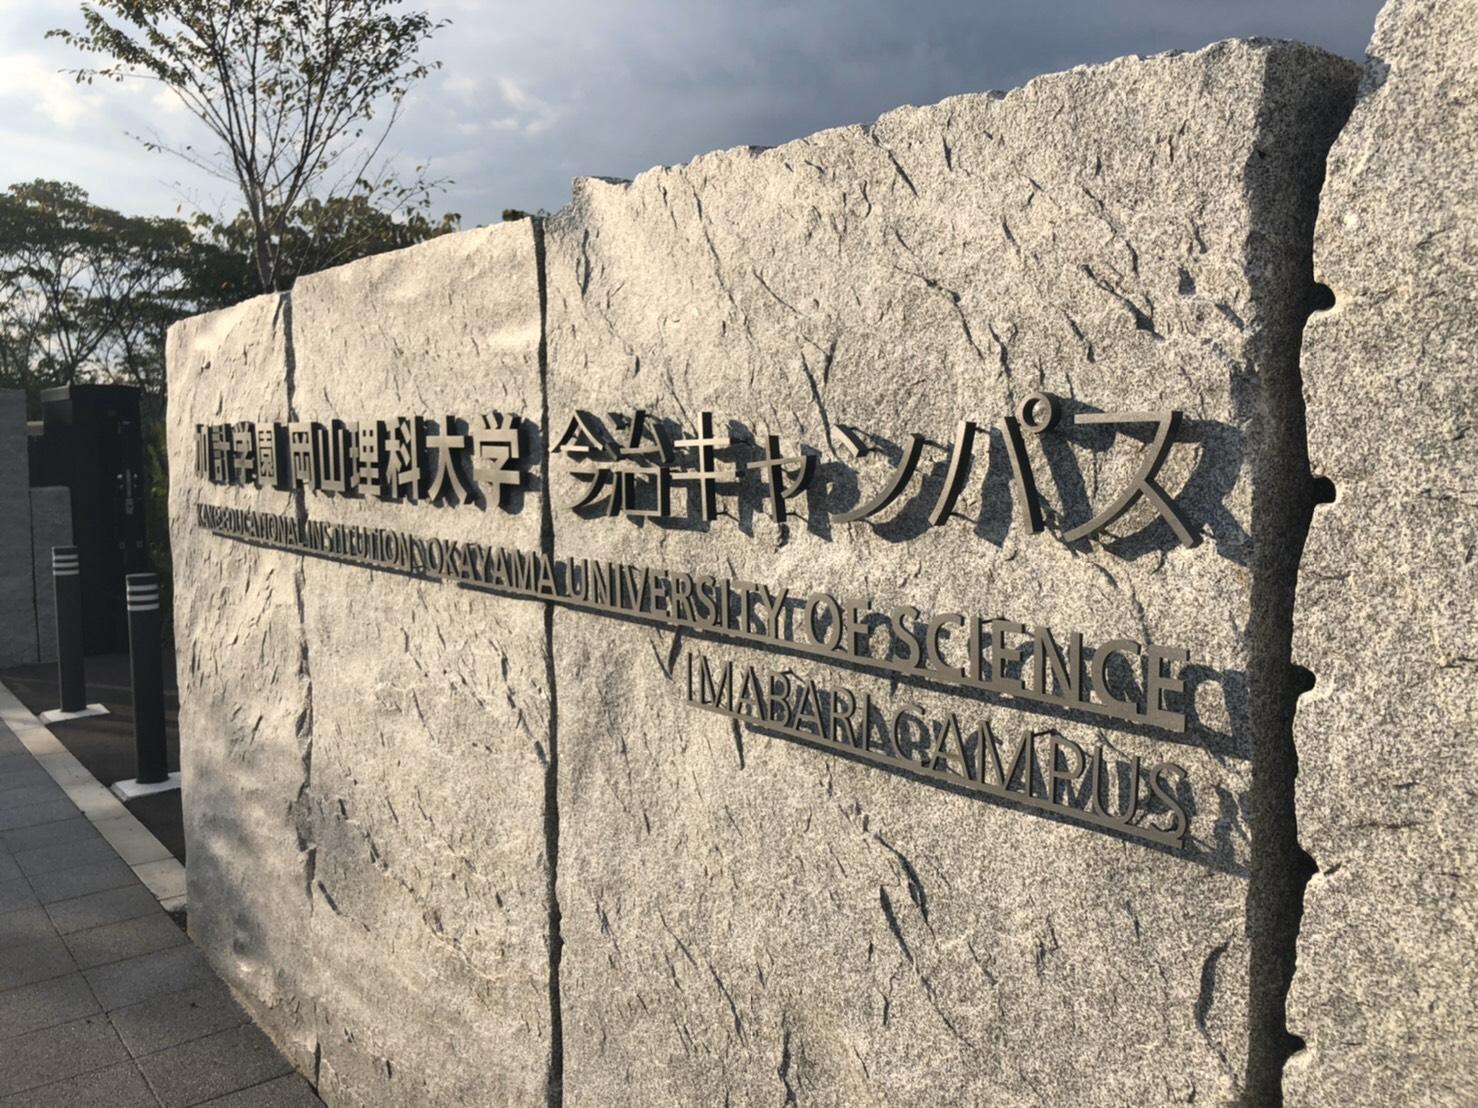 Kake Gakuen and Okayama University of Science